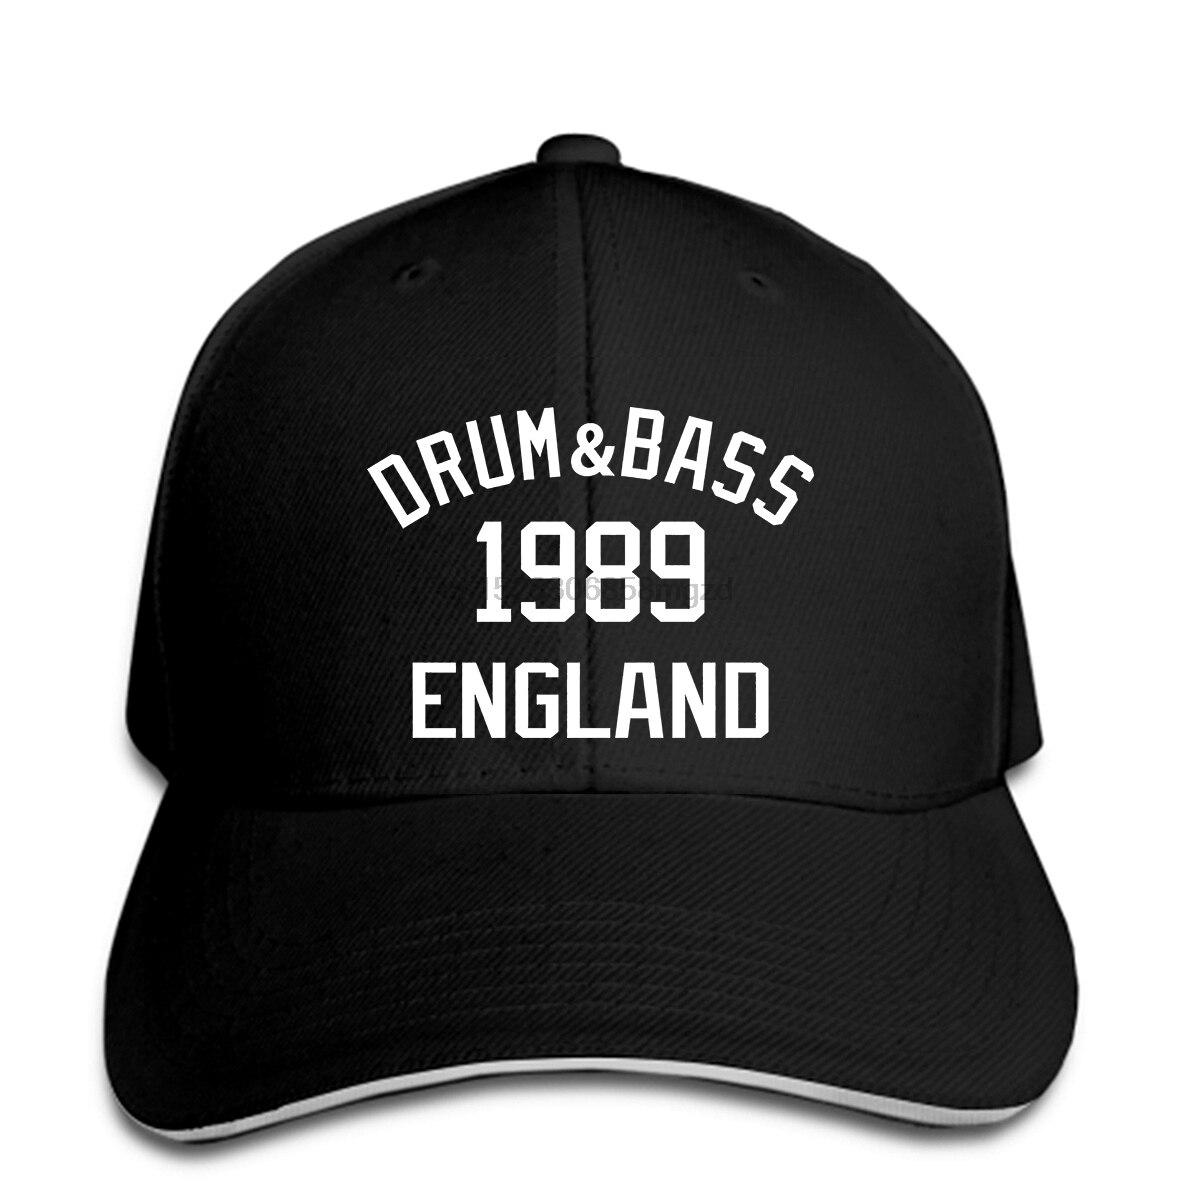 Estilo Vintage s divertido Bass Music de tambor corto 1989Goldie tambor N Bass DB hombres gorra de béisbol Snapback Cap mujeres Cap Peaked